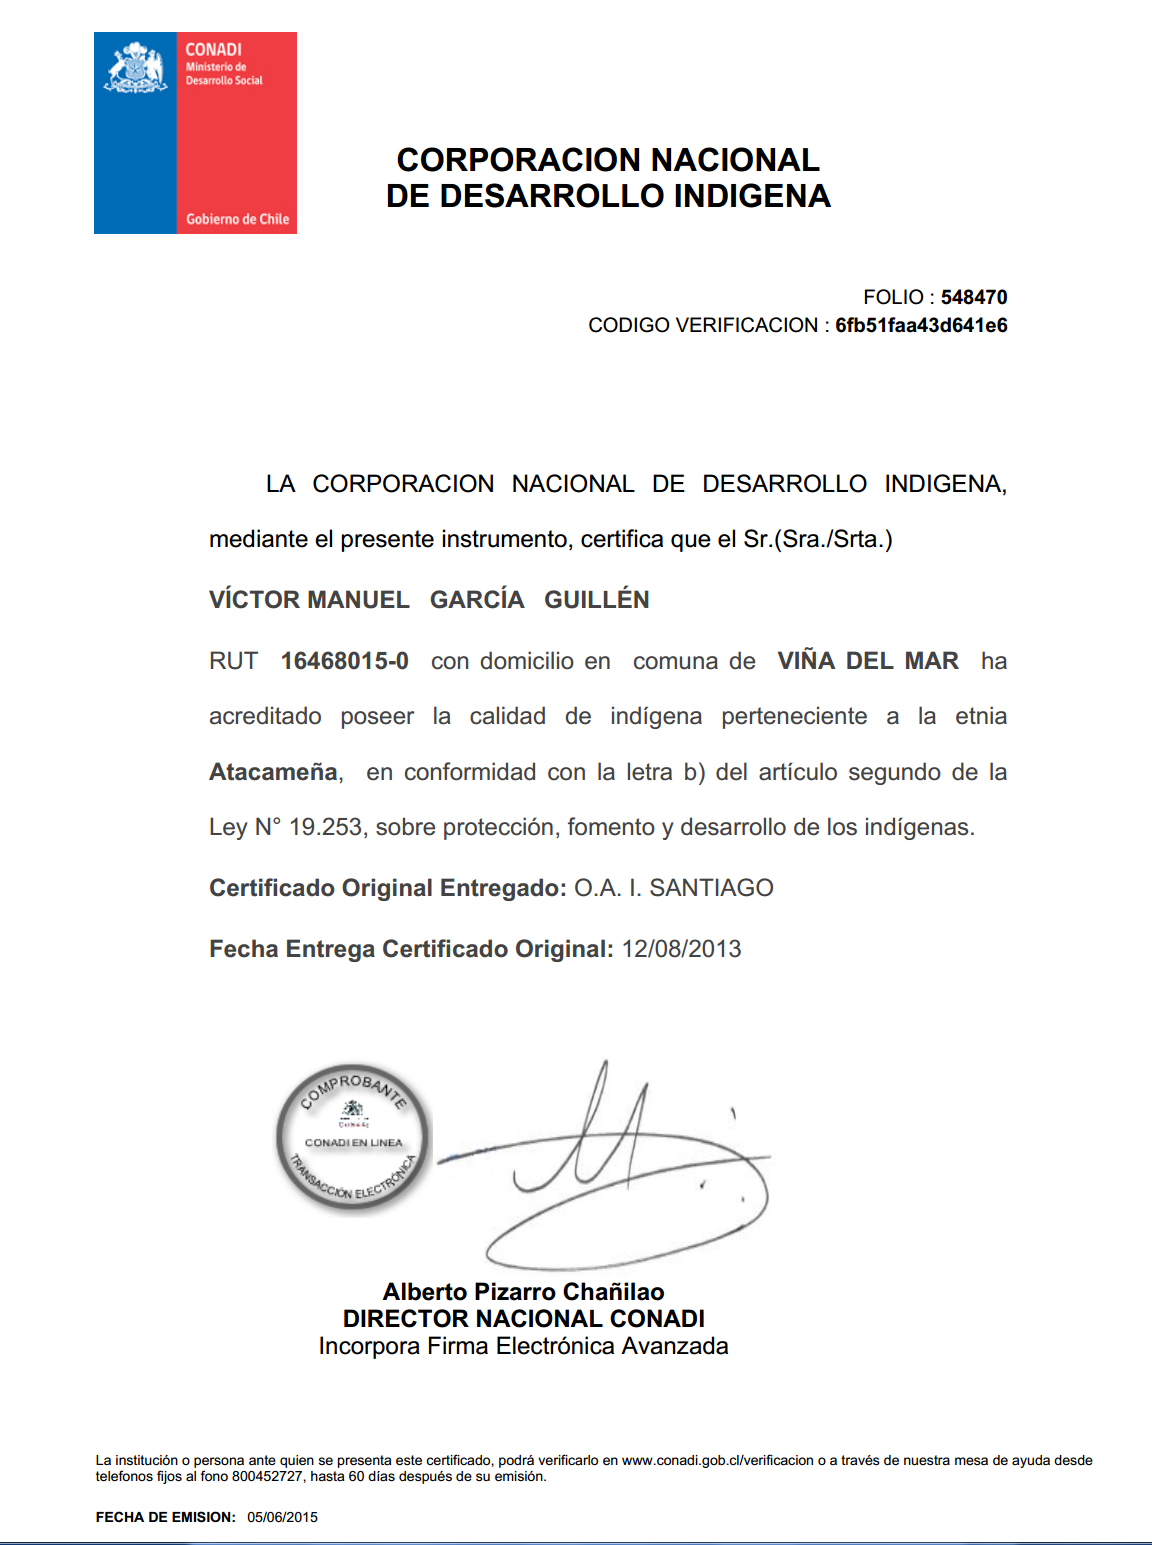 Victor Doblege: Curriculum Vitae Victor Doblege